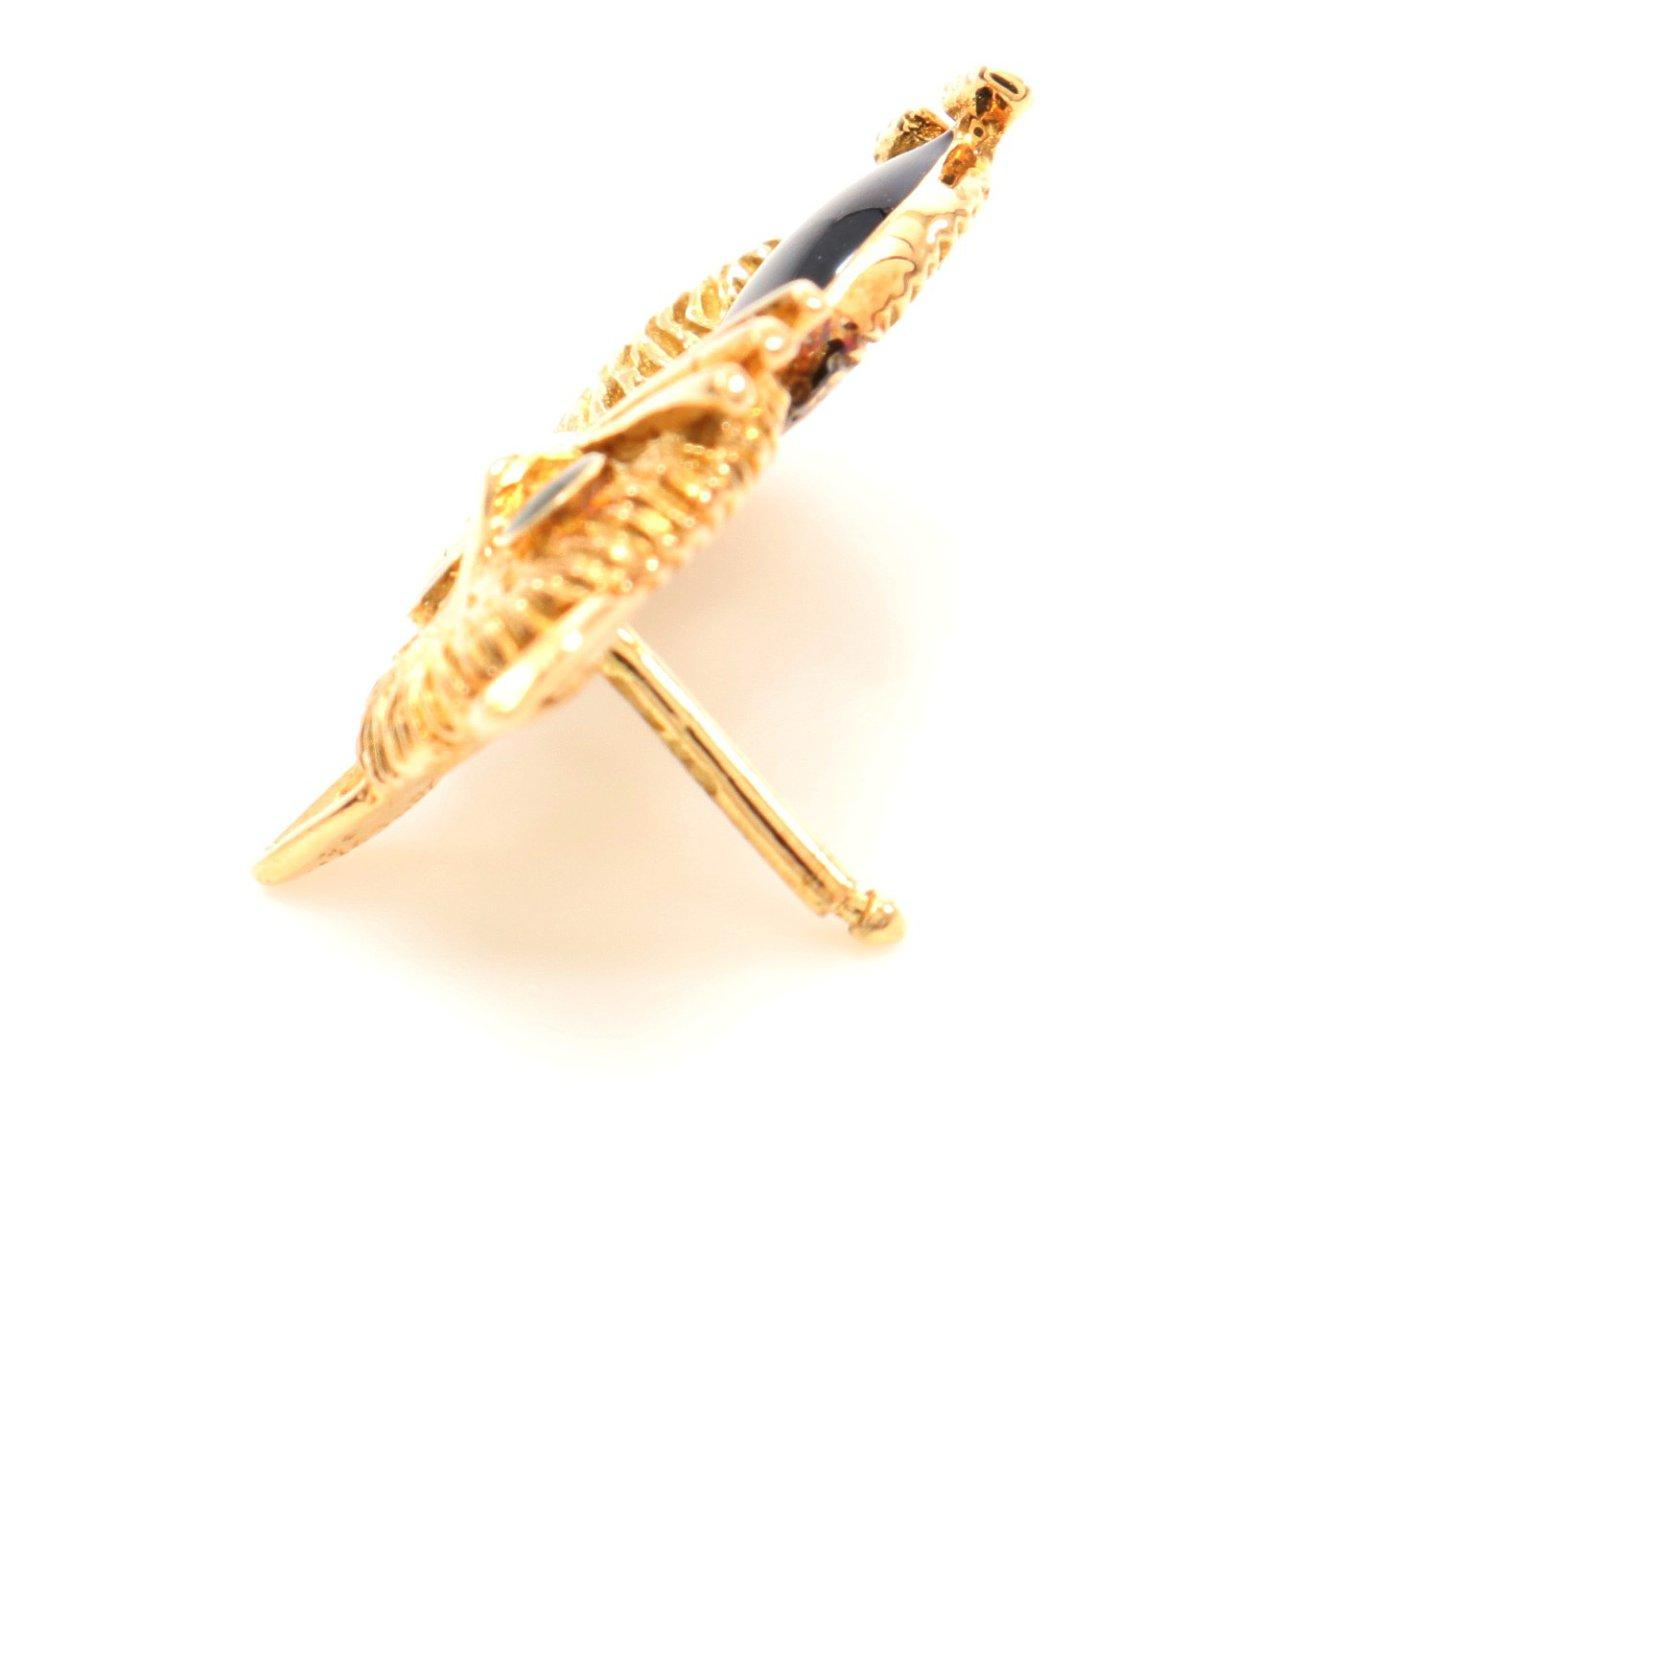 Van Cleef & Arpels・アクセサリー・アニマルクリップコレクション ブローチ ネコ キャット K18YG 七宝 イエローゴールド ブラック グリーン